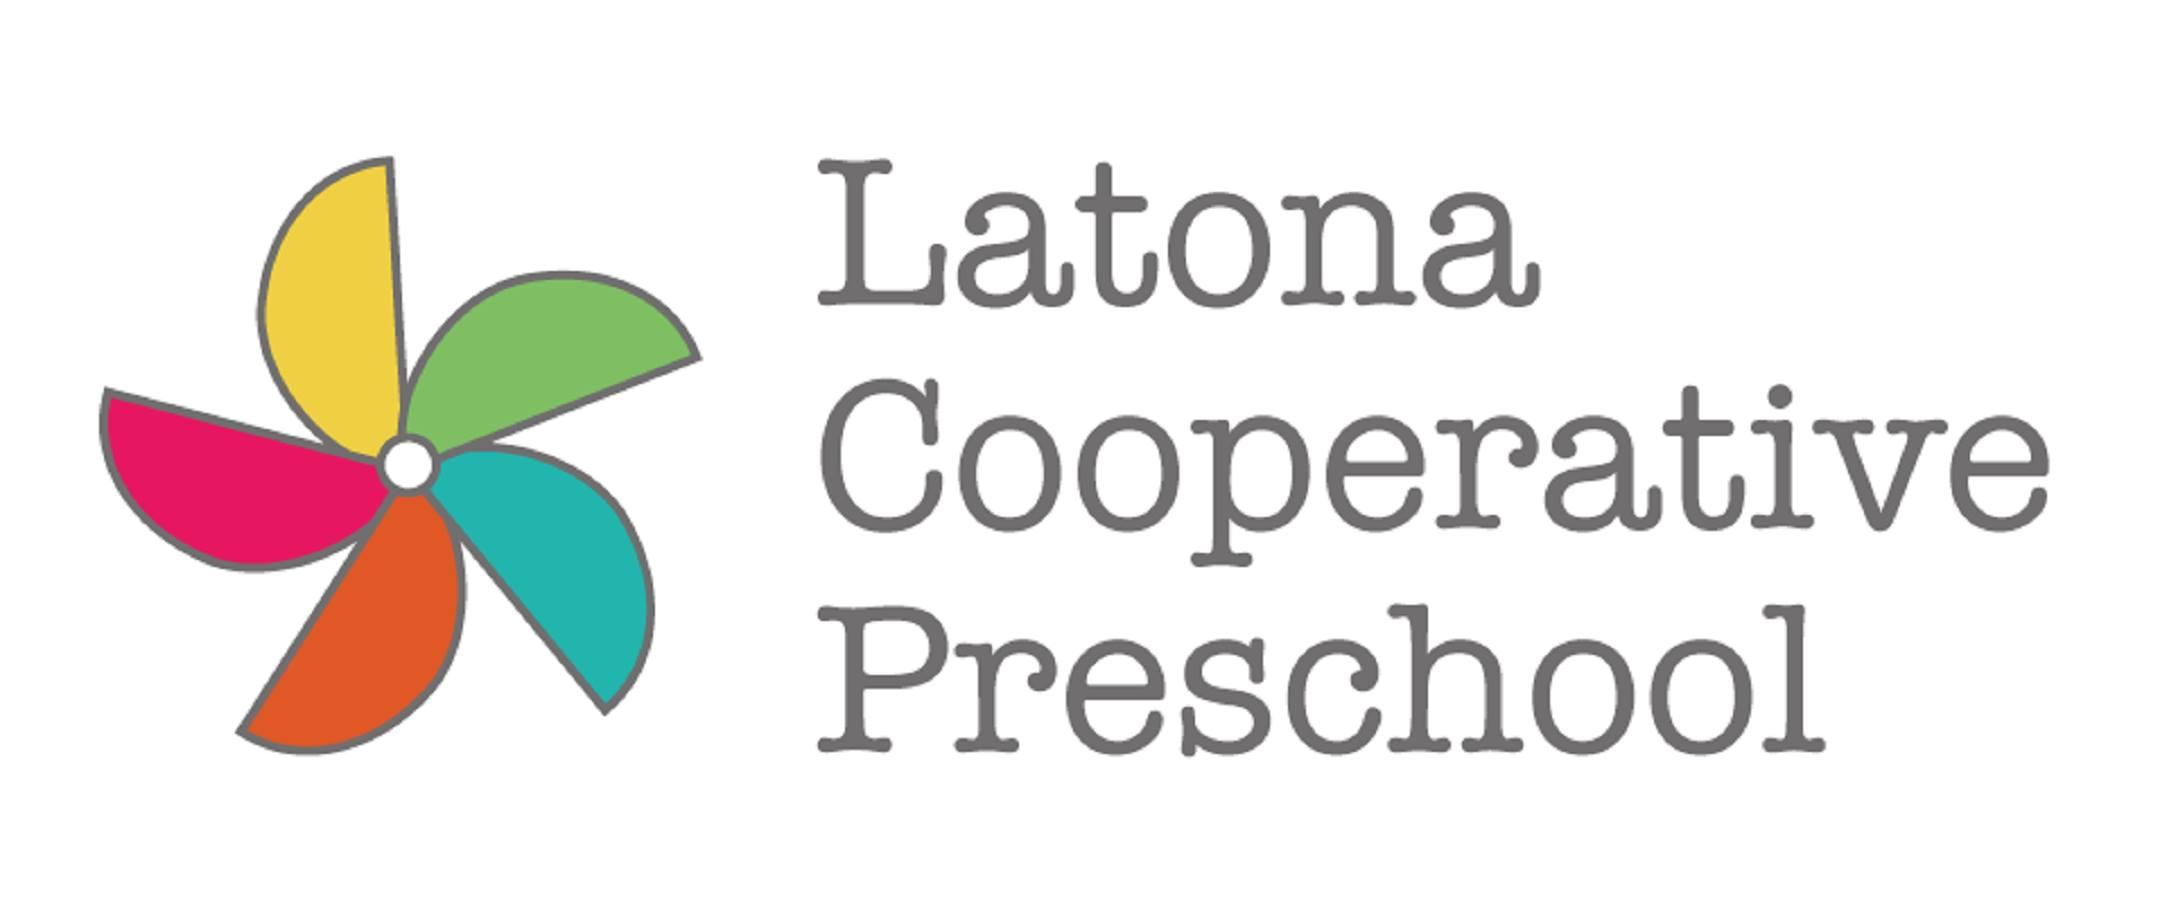 Latona Cooperative Preschool